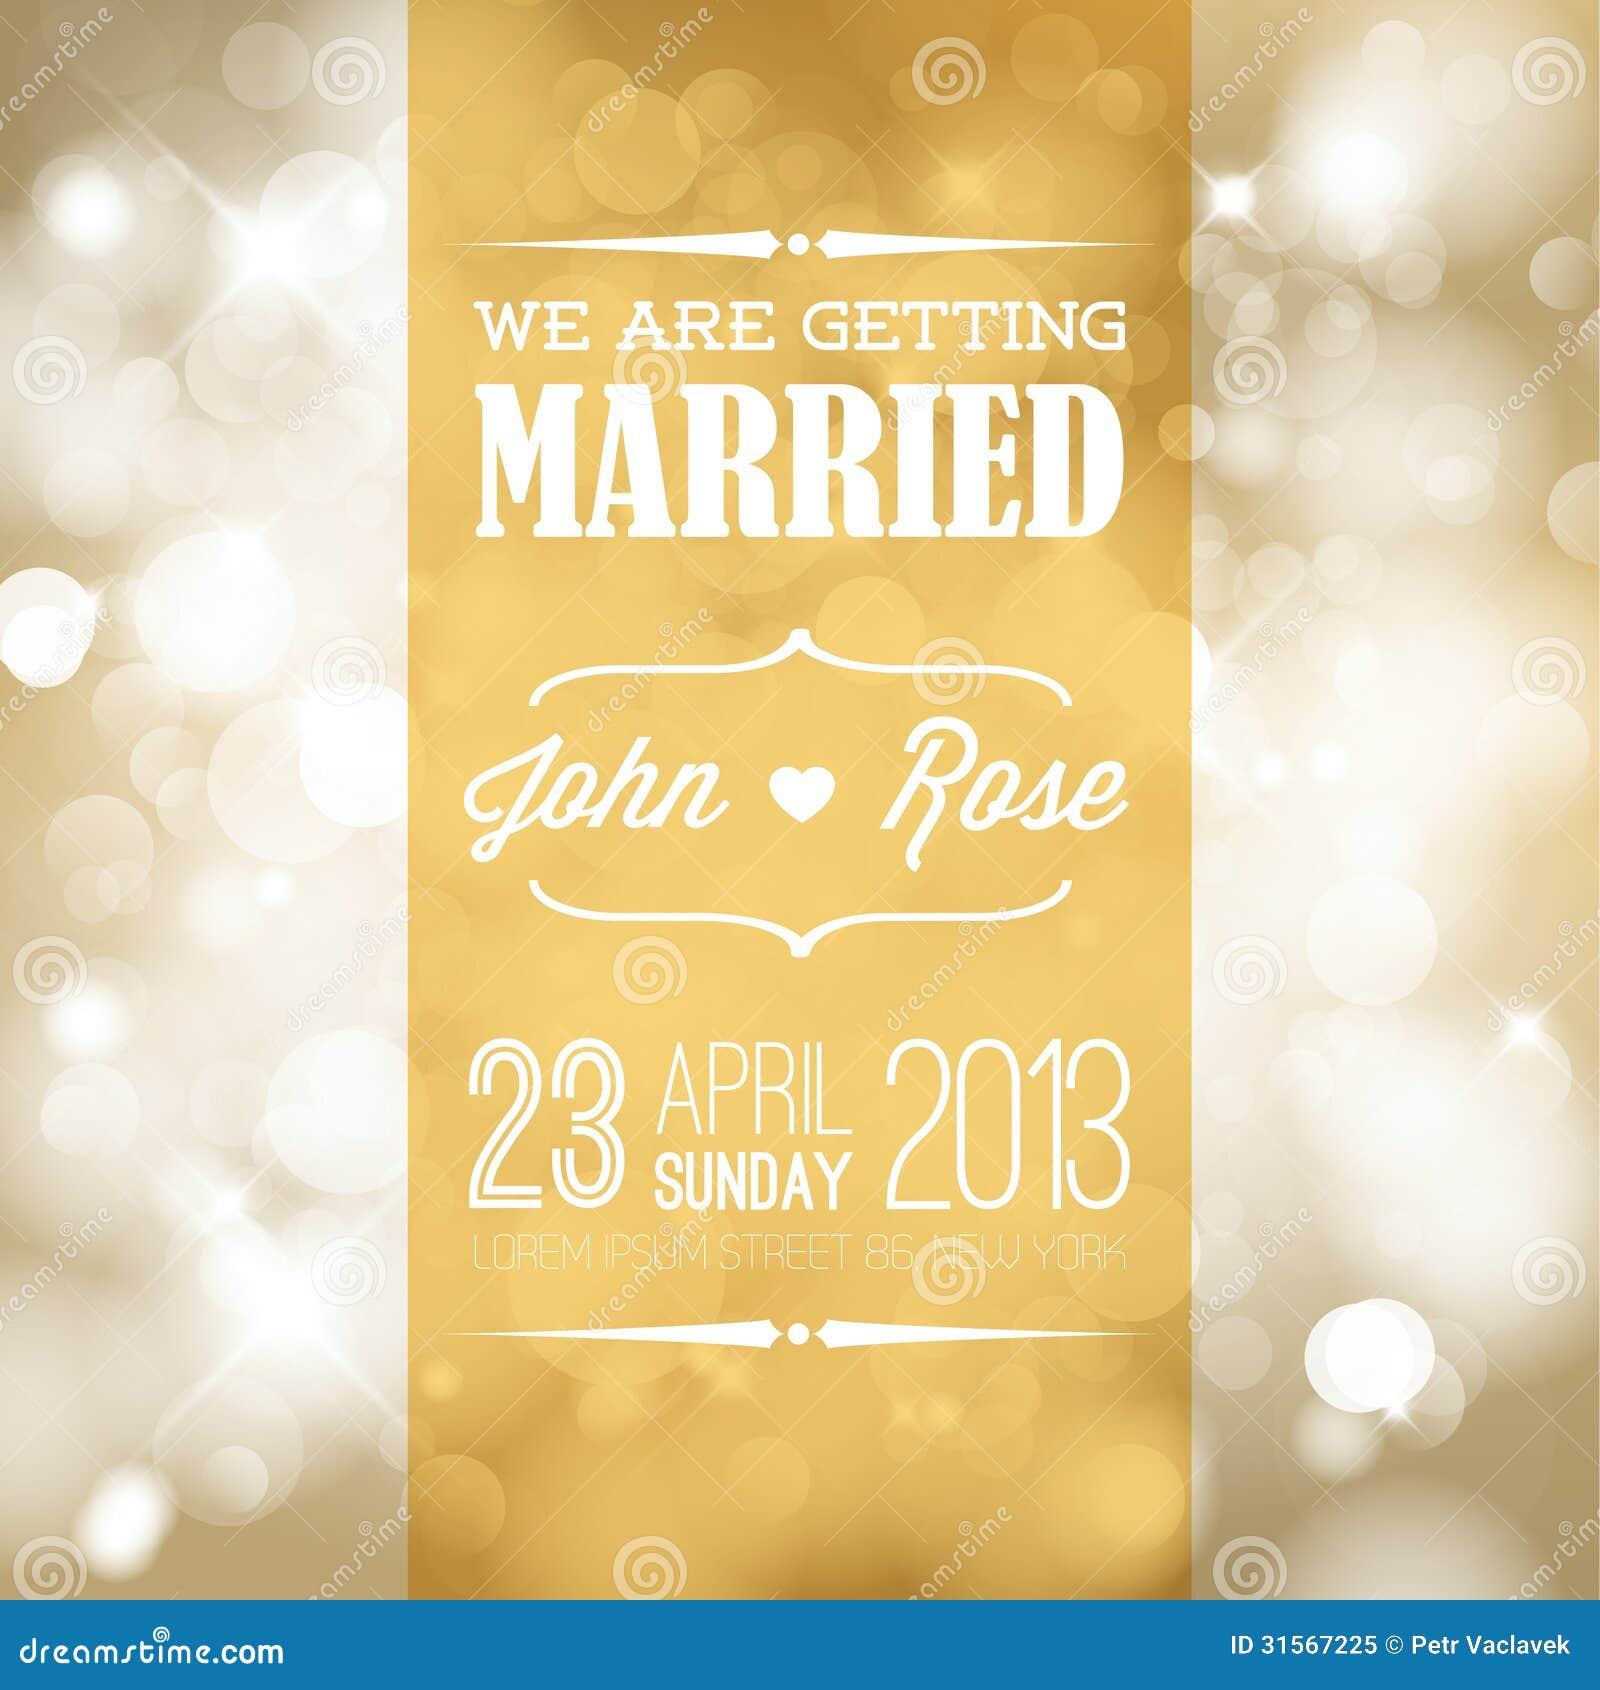 Vector Wedding Invitation Royalty Free Stock Photo - Image: 31567225